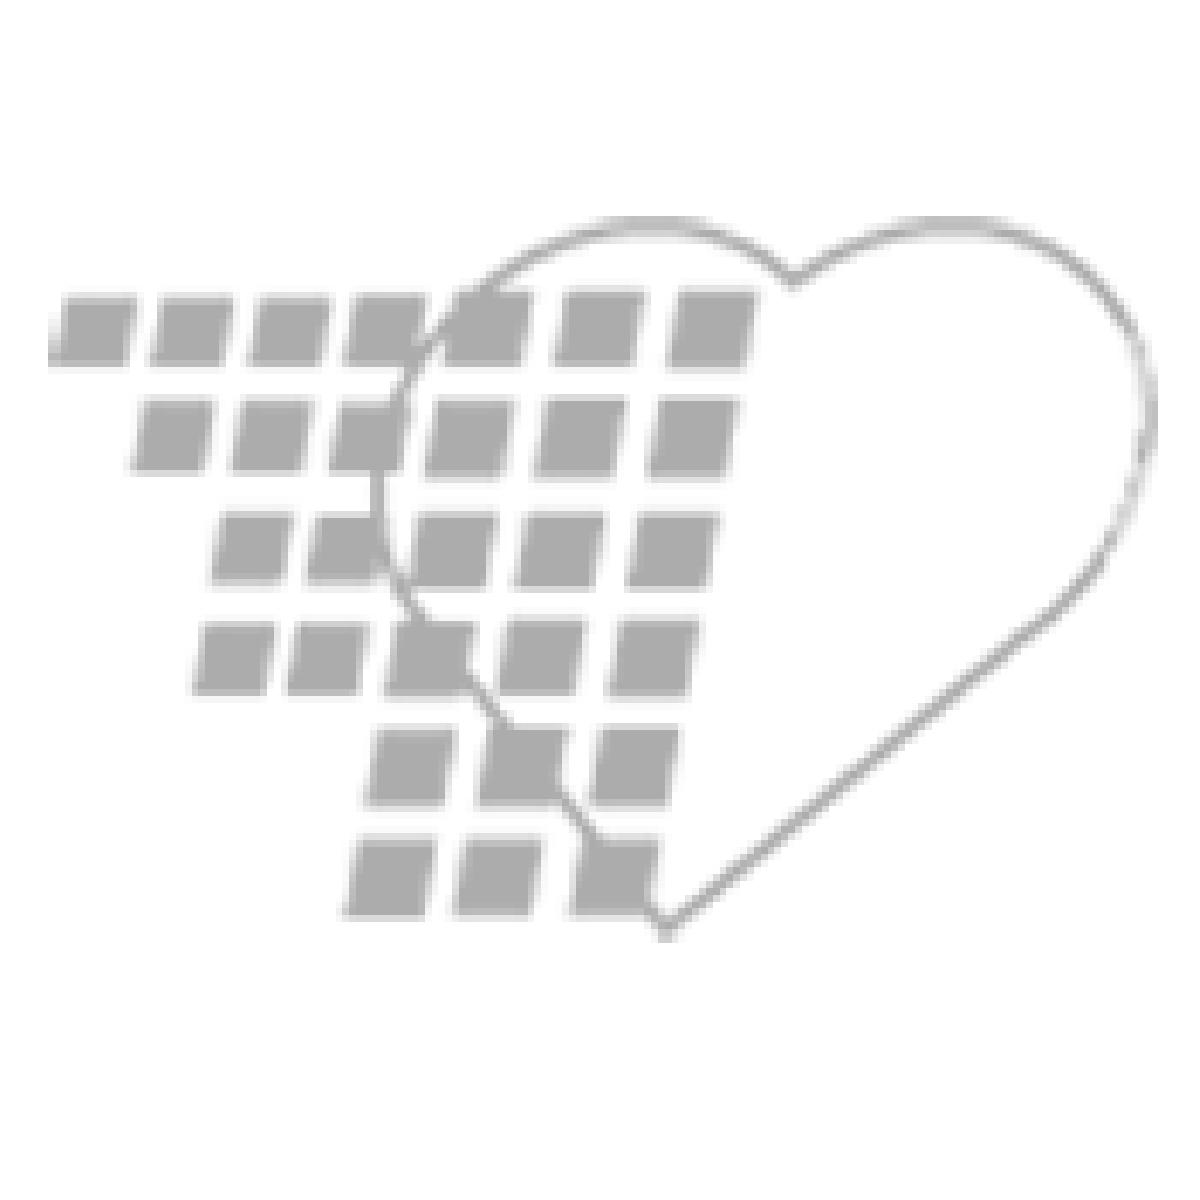 06-93-0720 Demo Dose® Oral Medication Set #2